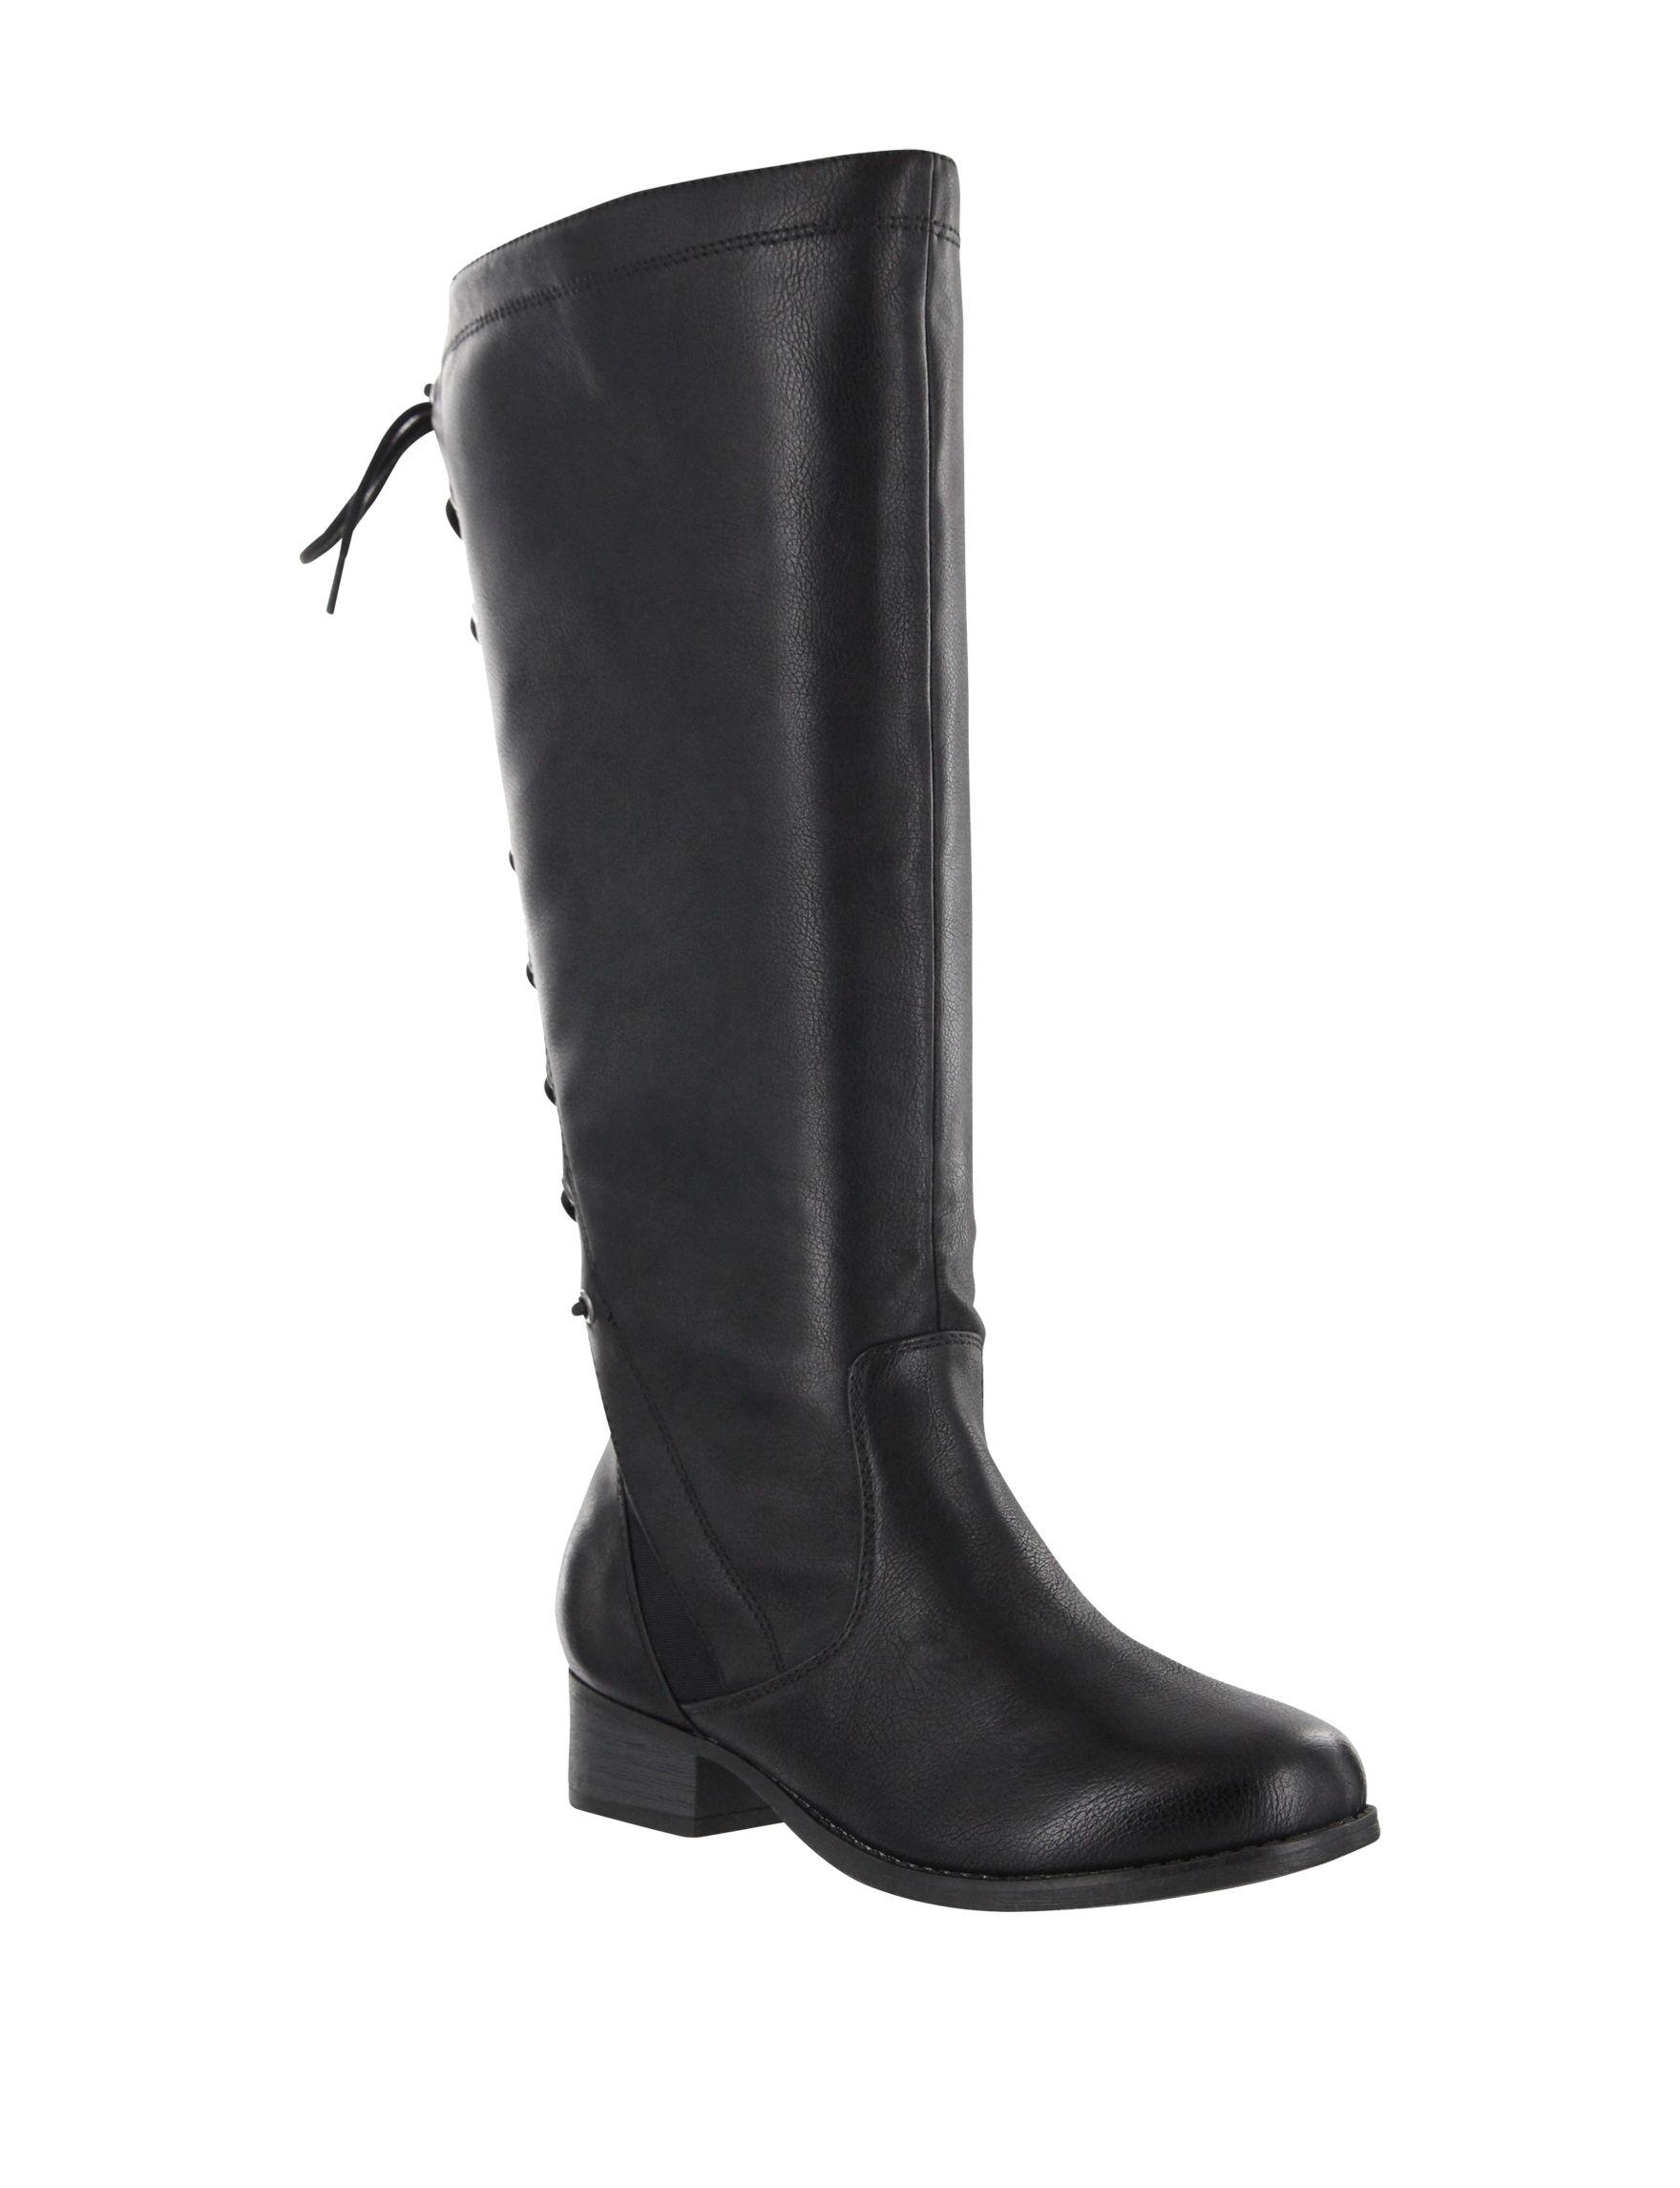 Mia Amore Black Riding Boots Wide Calf